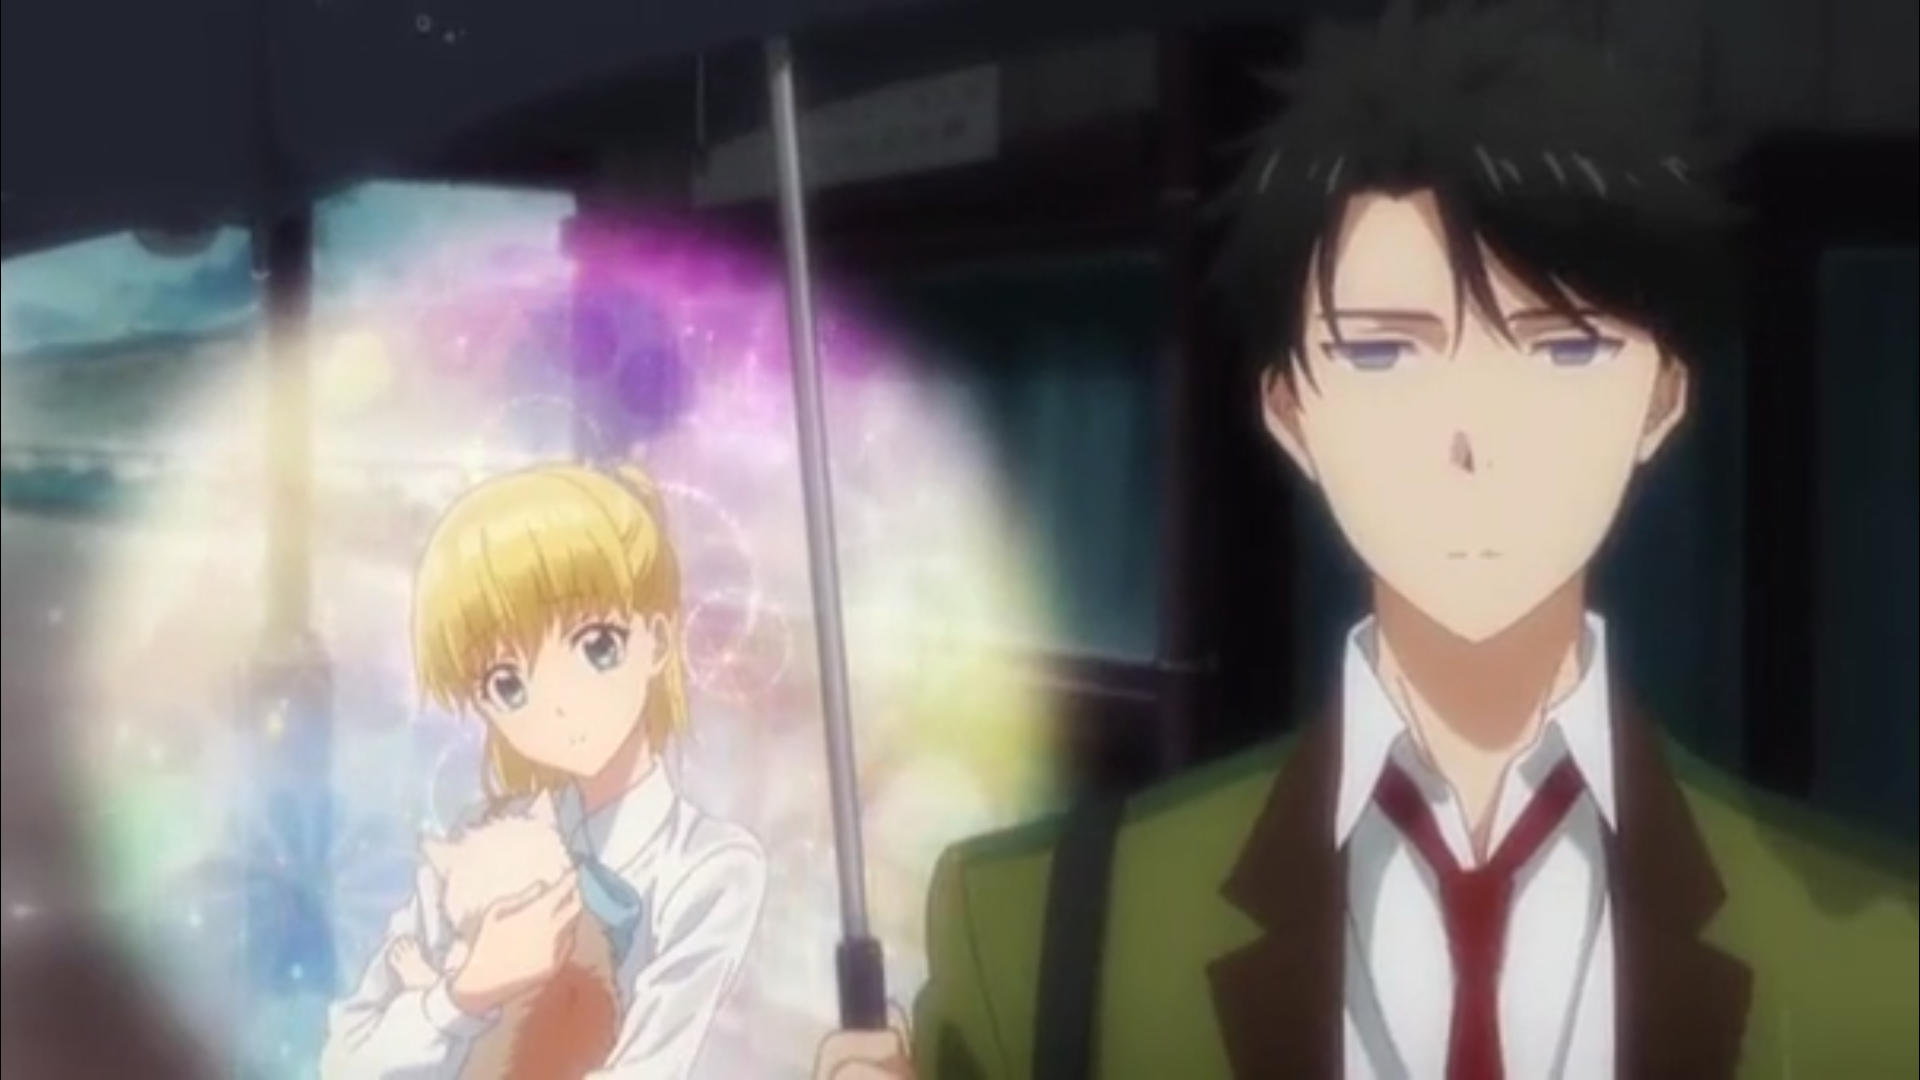 anime_1305_20180407191246504.jpg